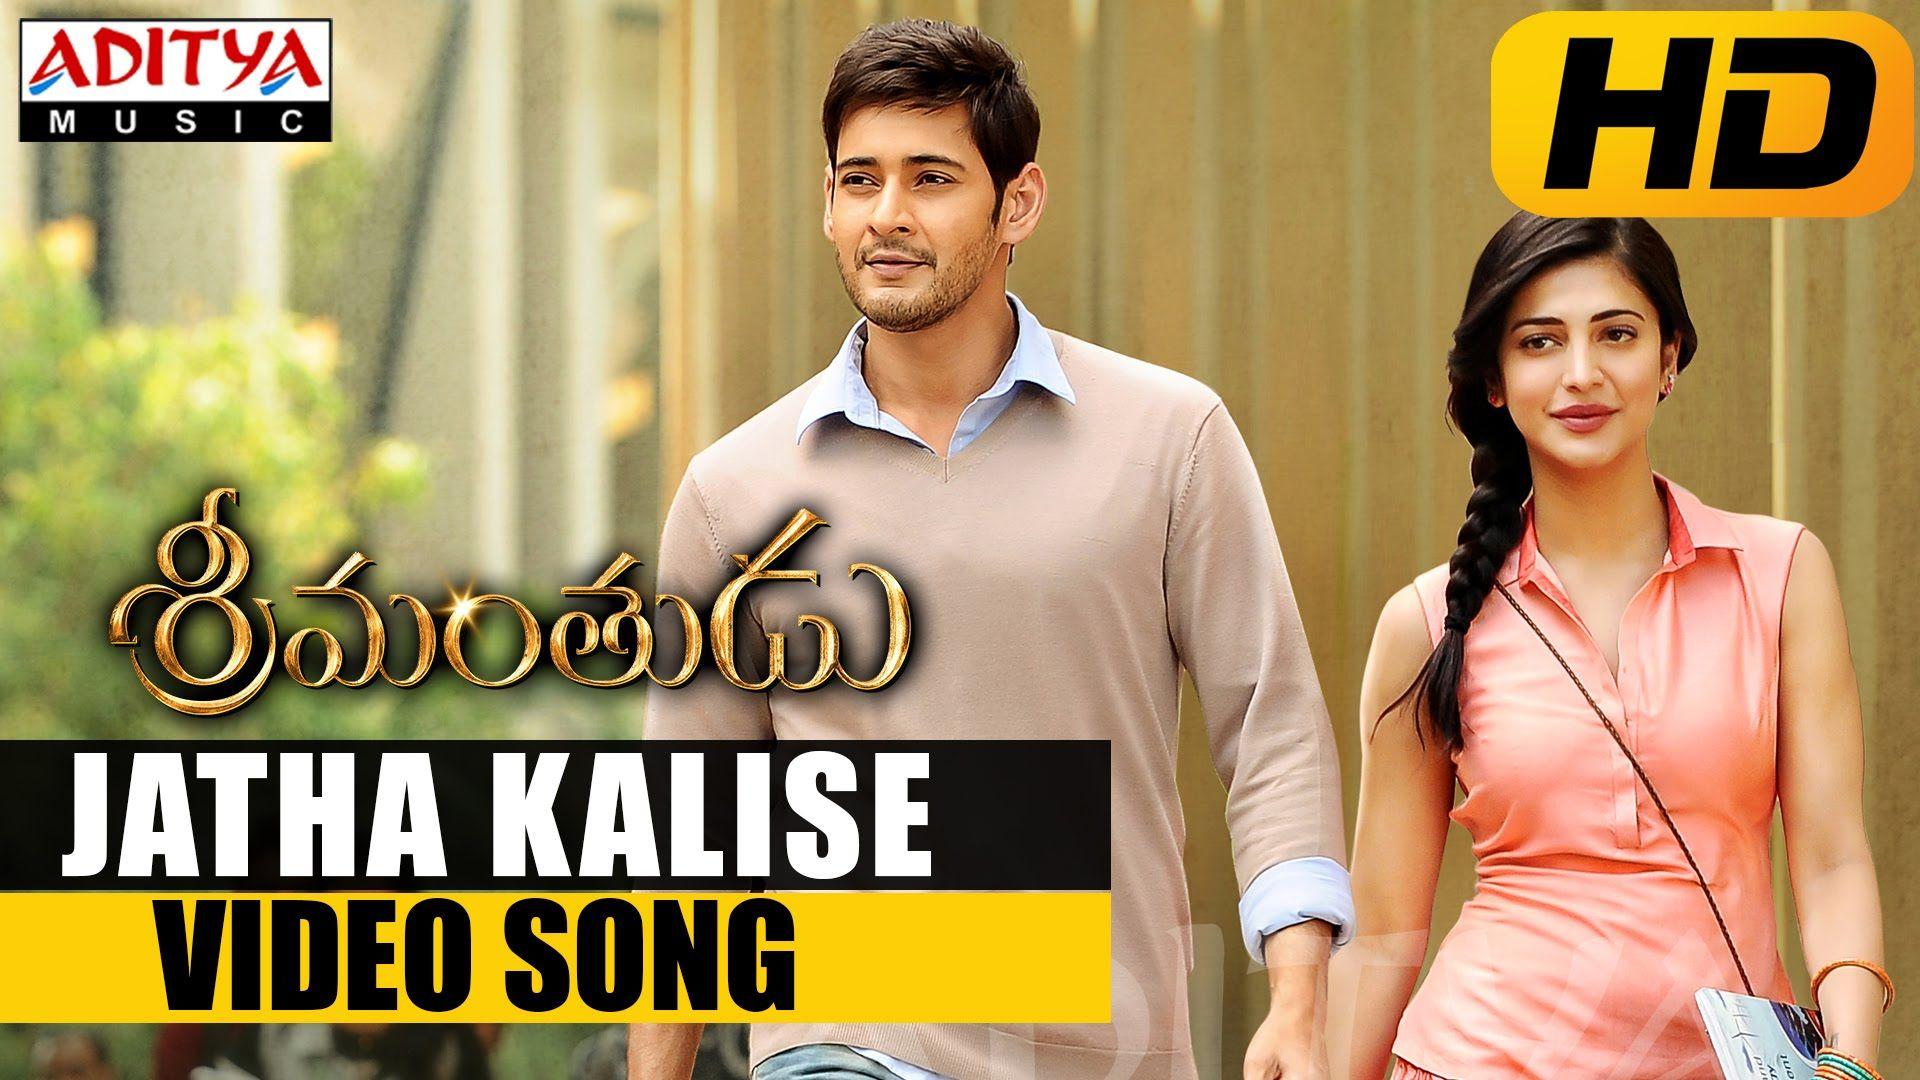 Jatha Kalise Video Song Edited Version Srimanthudu Telugu Movie Songs Telugu Movies Bollywood Movie Songs